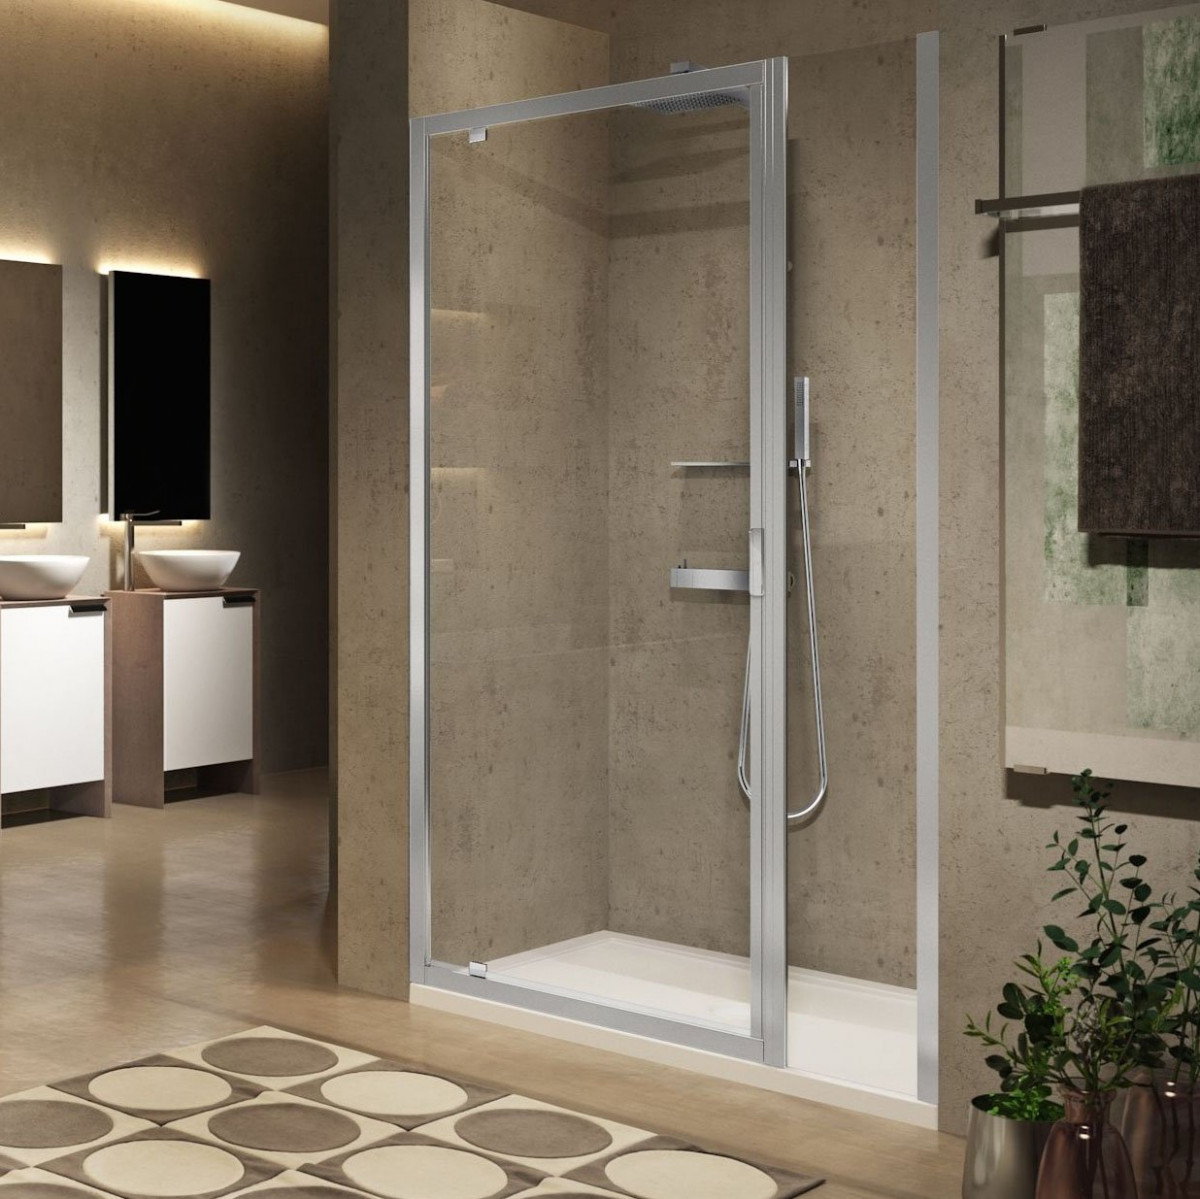 Novellini lunes 2 0 g f pivot shower door with fixed for Novellini shower doors